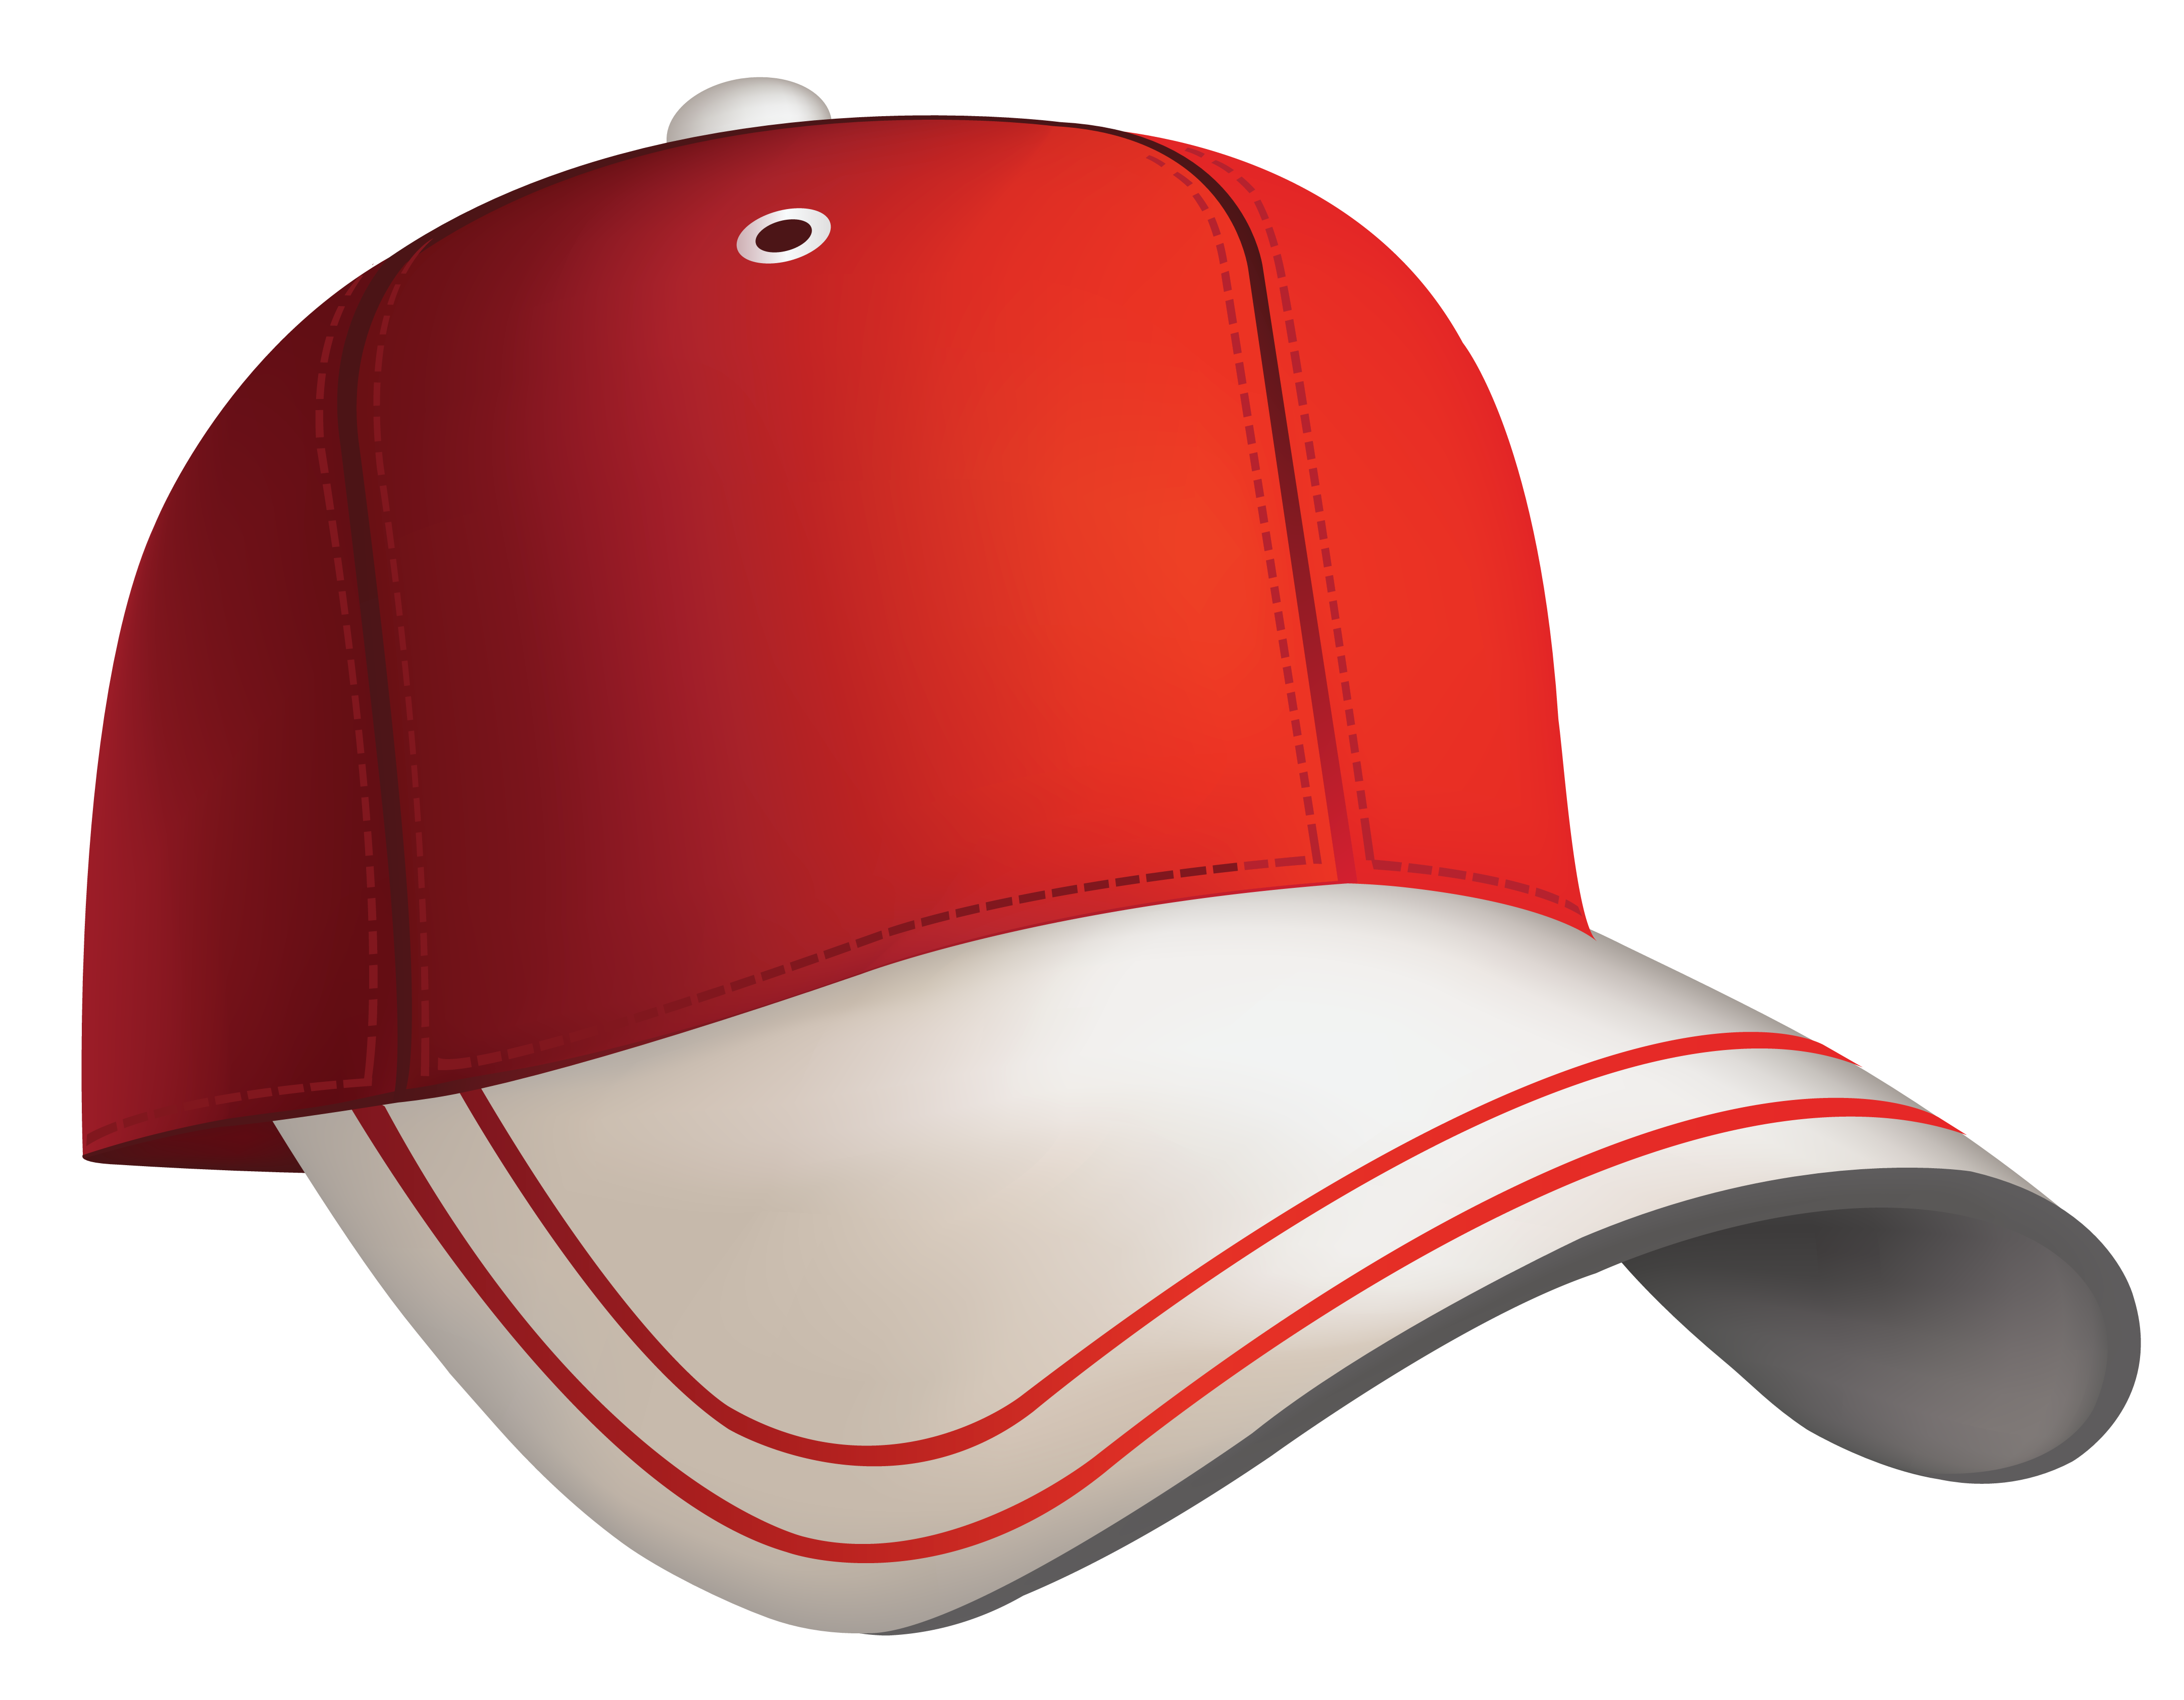 Red baseball . Cap clipart